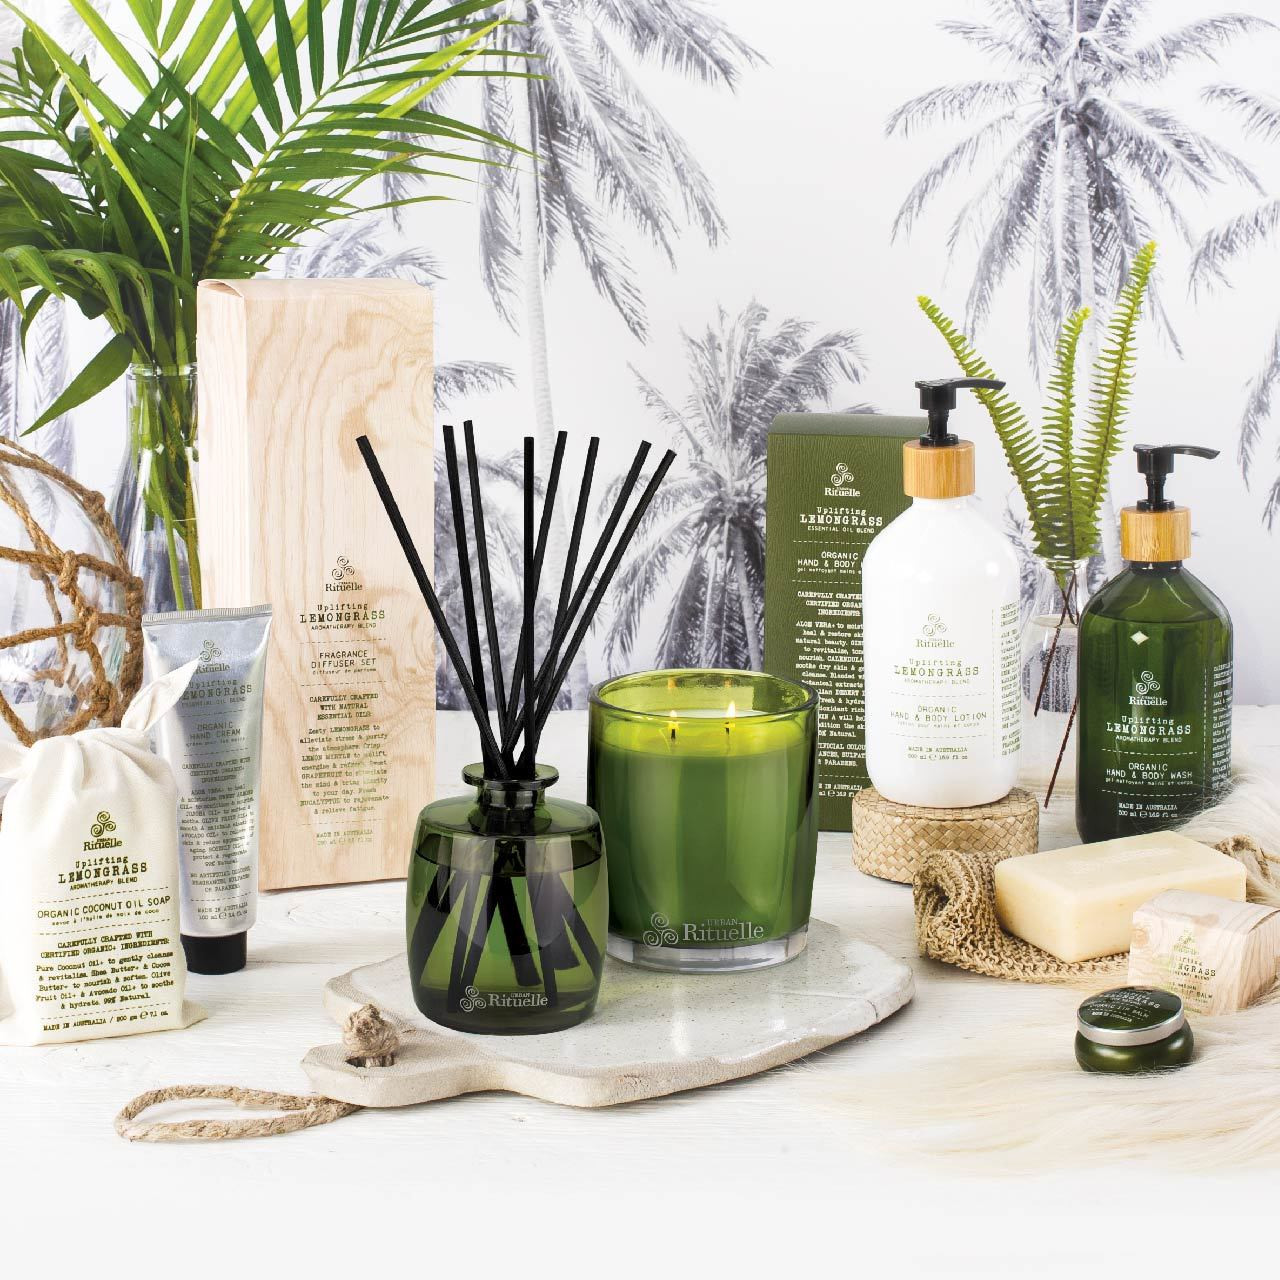 Flourish Organics - Lemongrass - Urban Rituelle